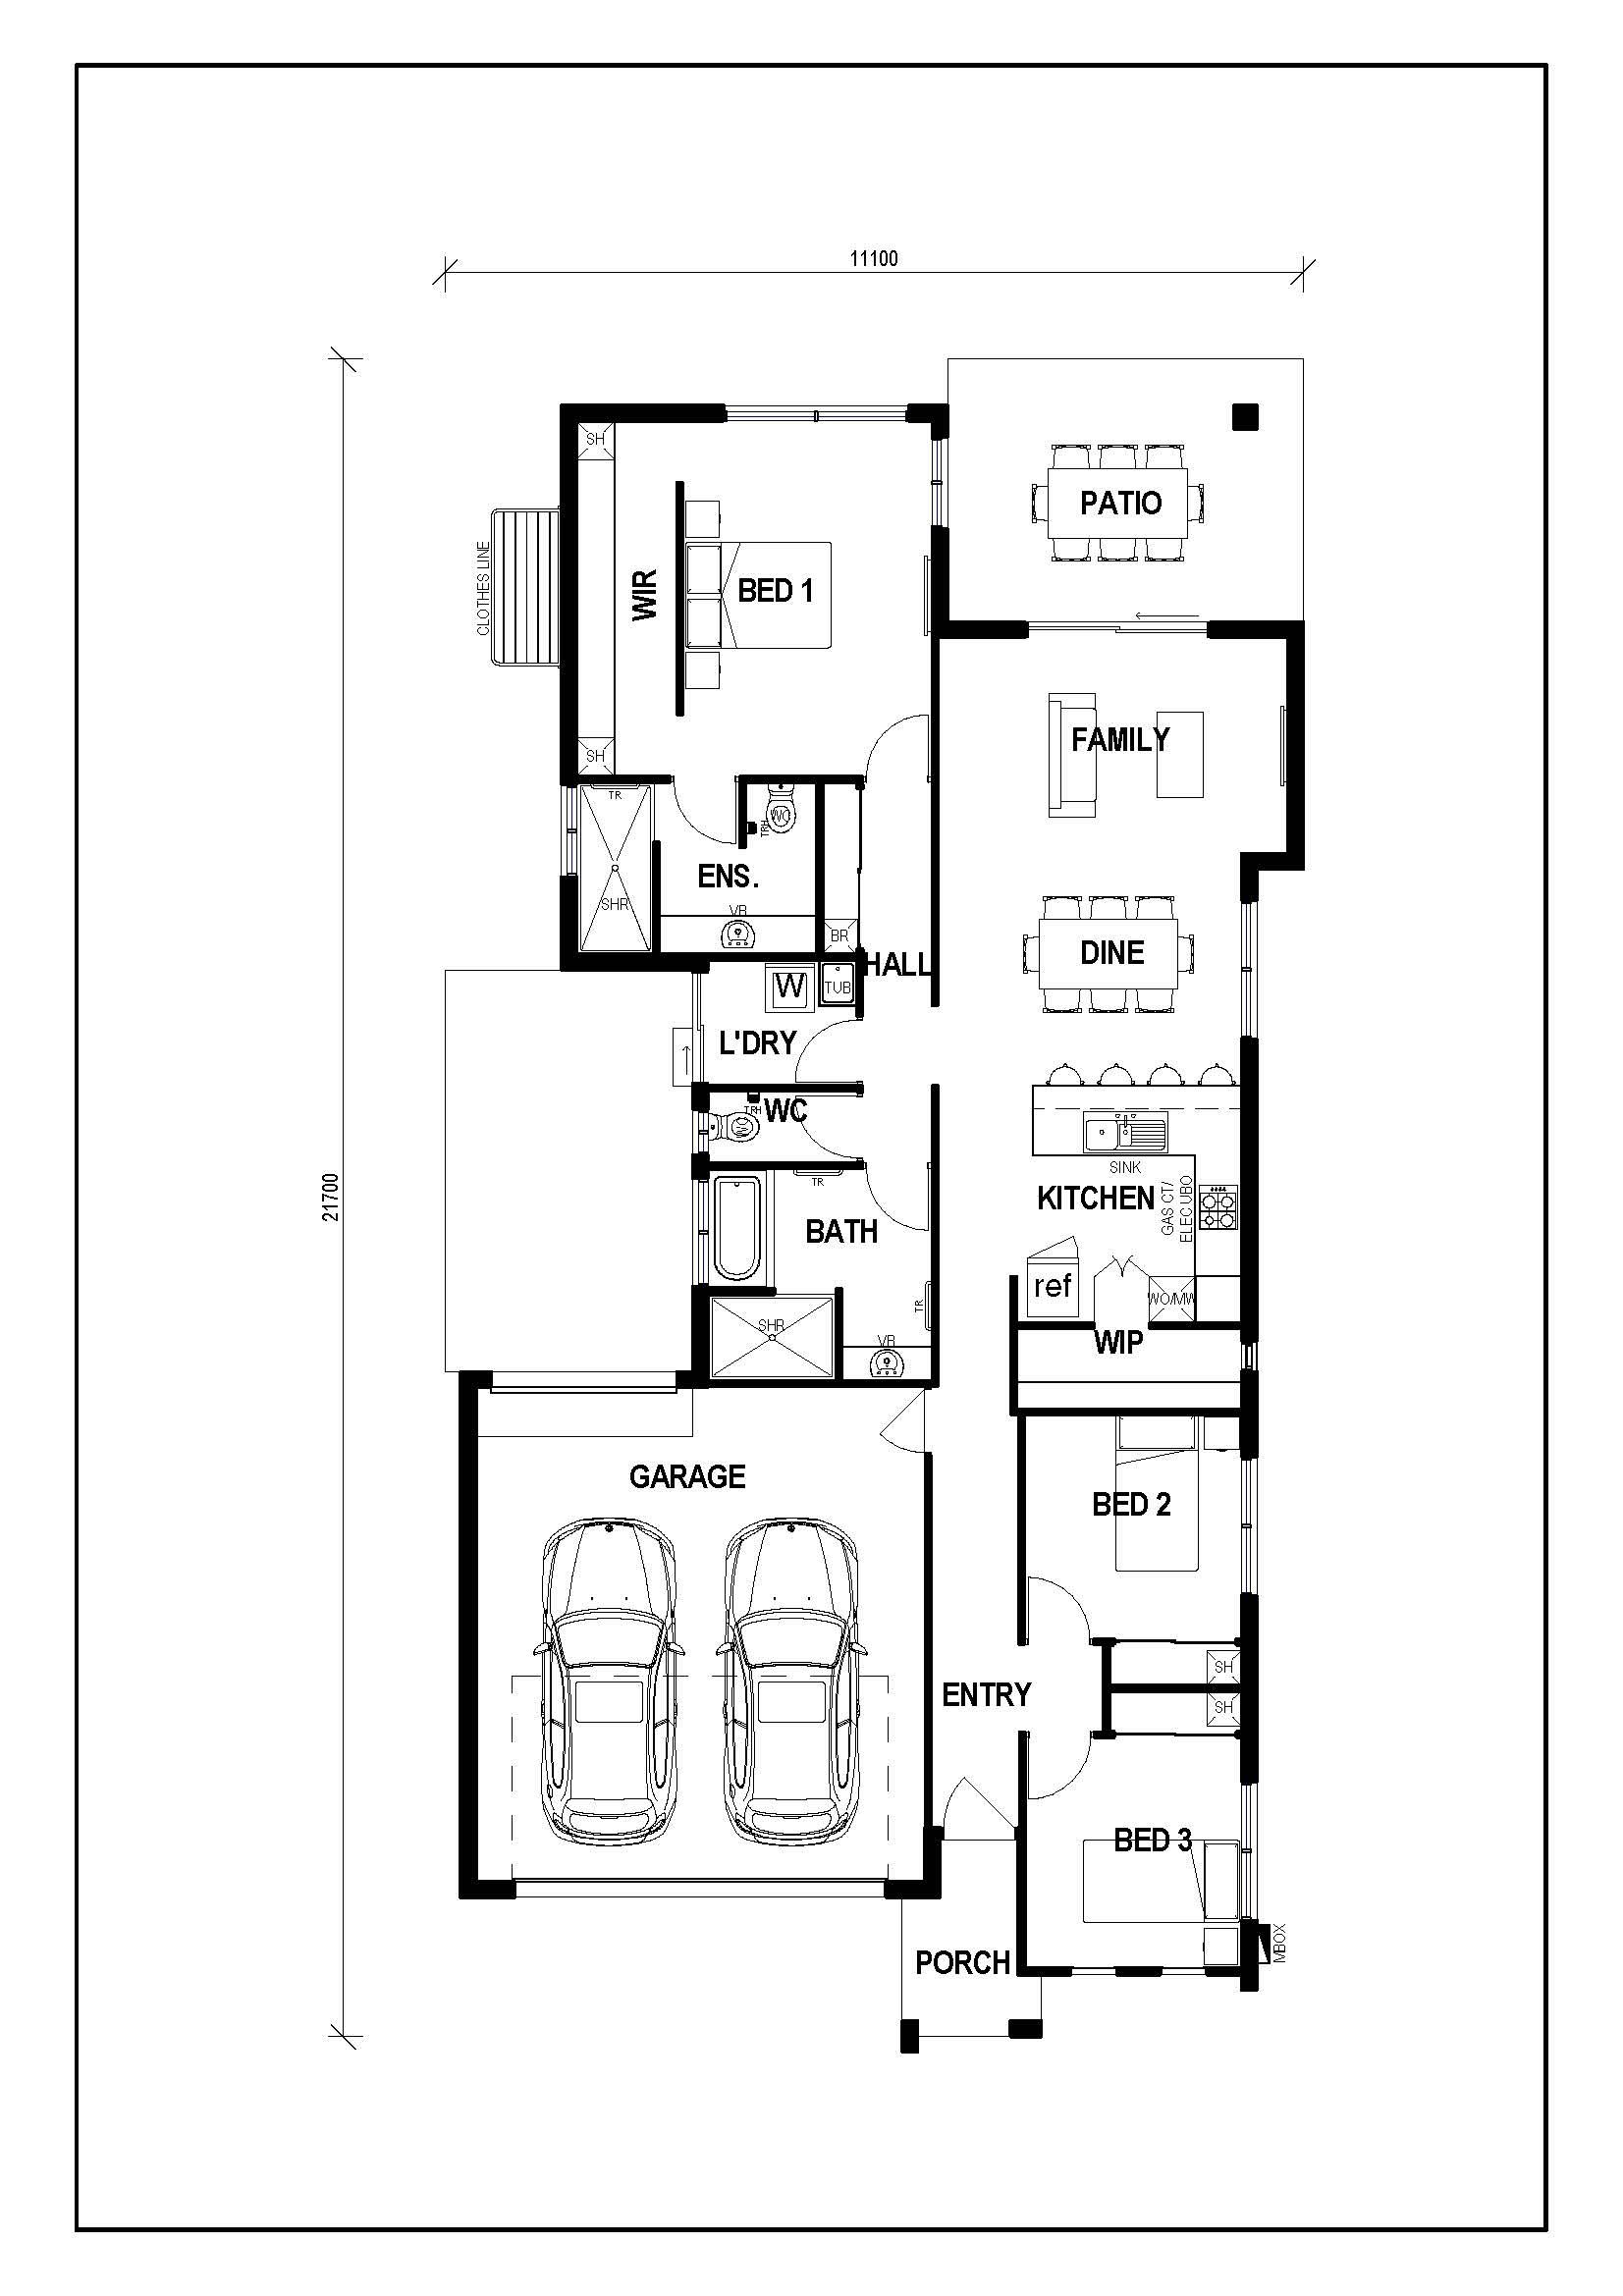 SAHARA A Floor Plan.jpg